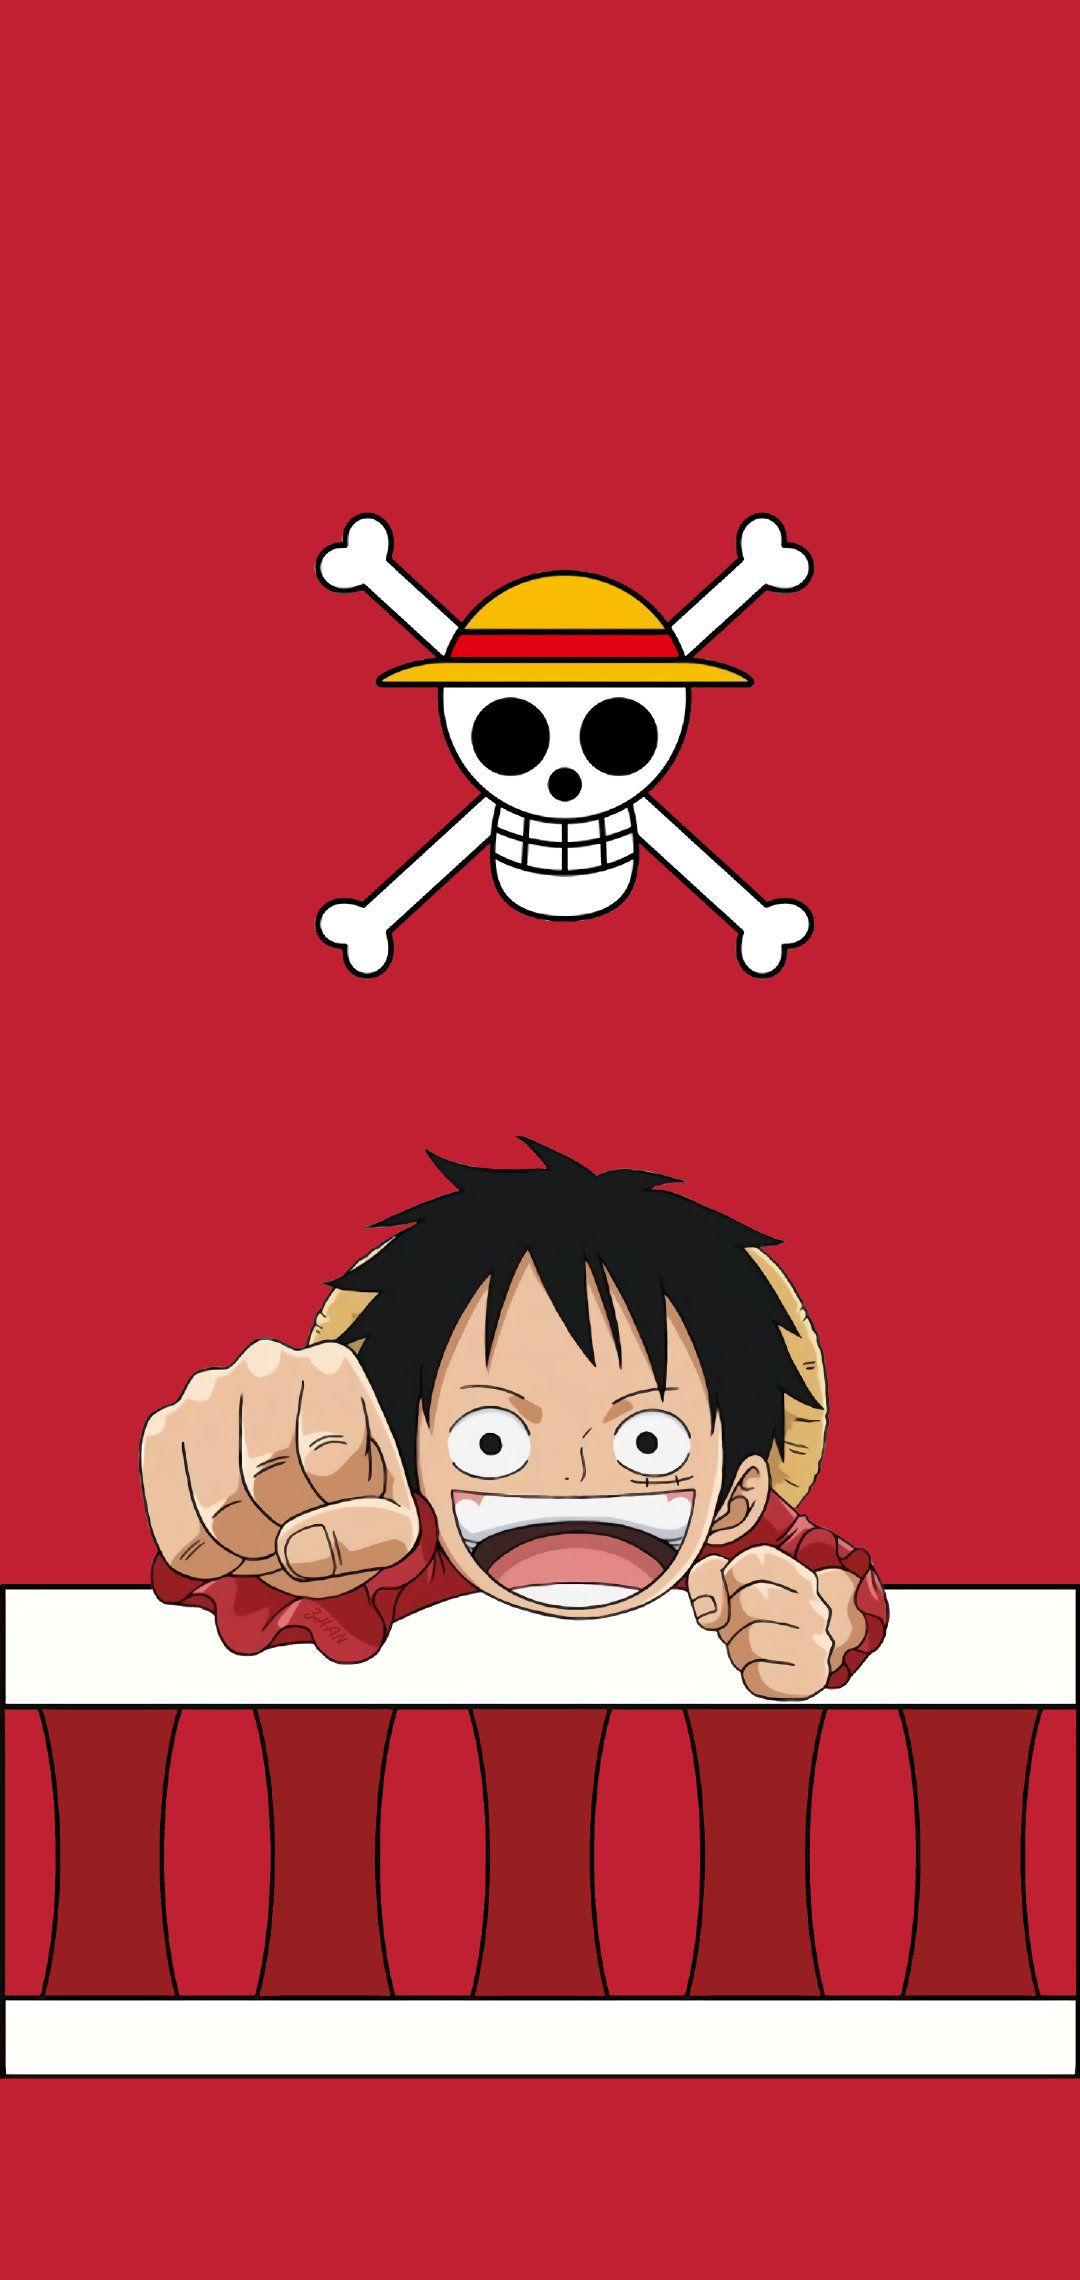 Pin Oleh I Anime Di Monkey D Luffy Ilustrasi Komik Kartun Tokoh Sejarah Anime wallpaper for vivo y53